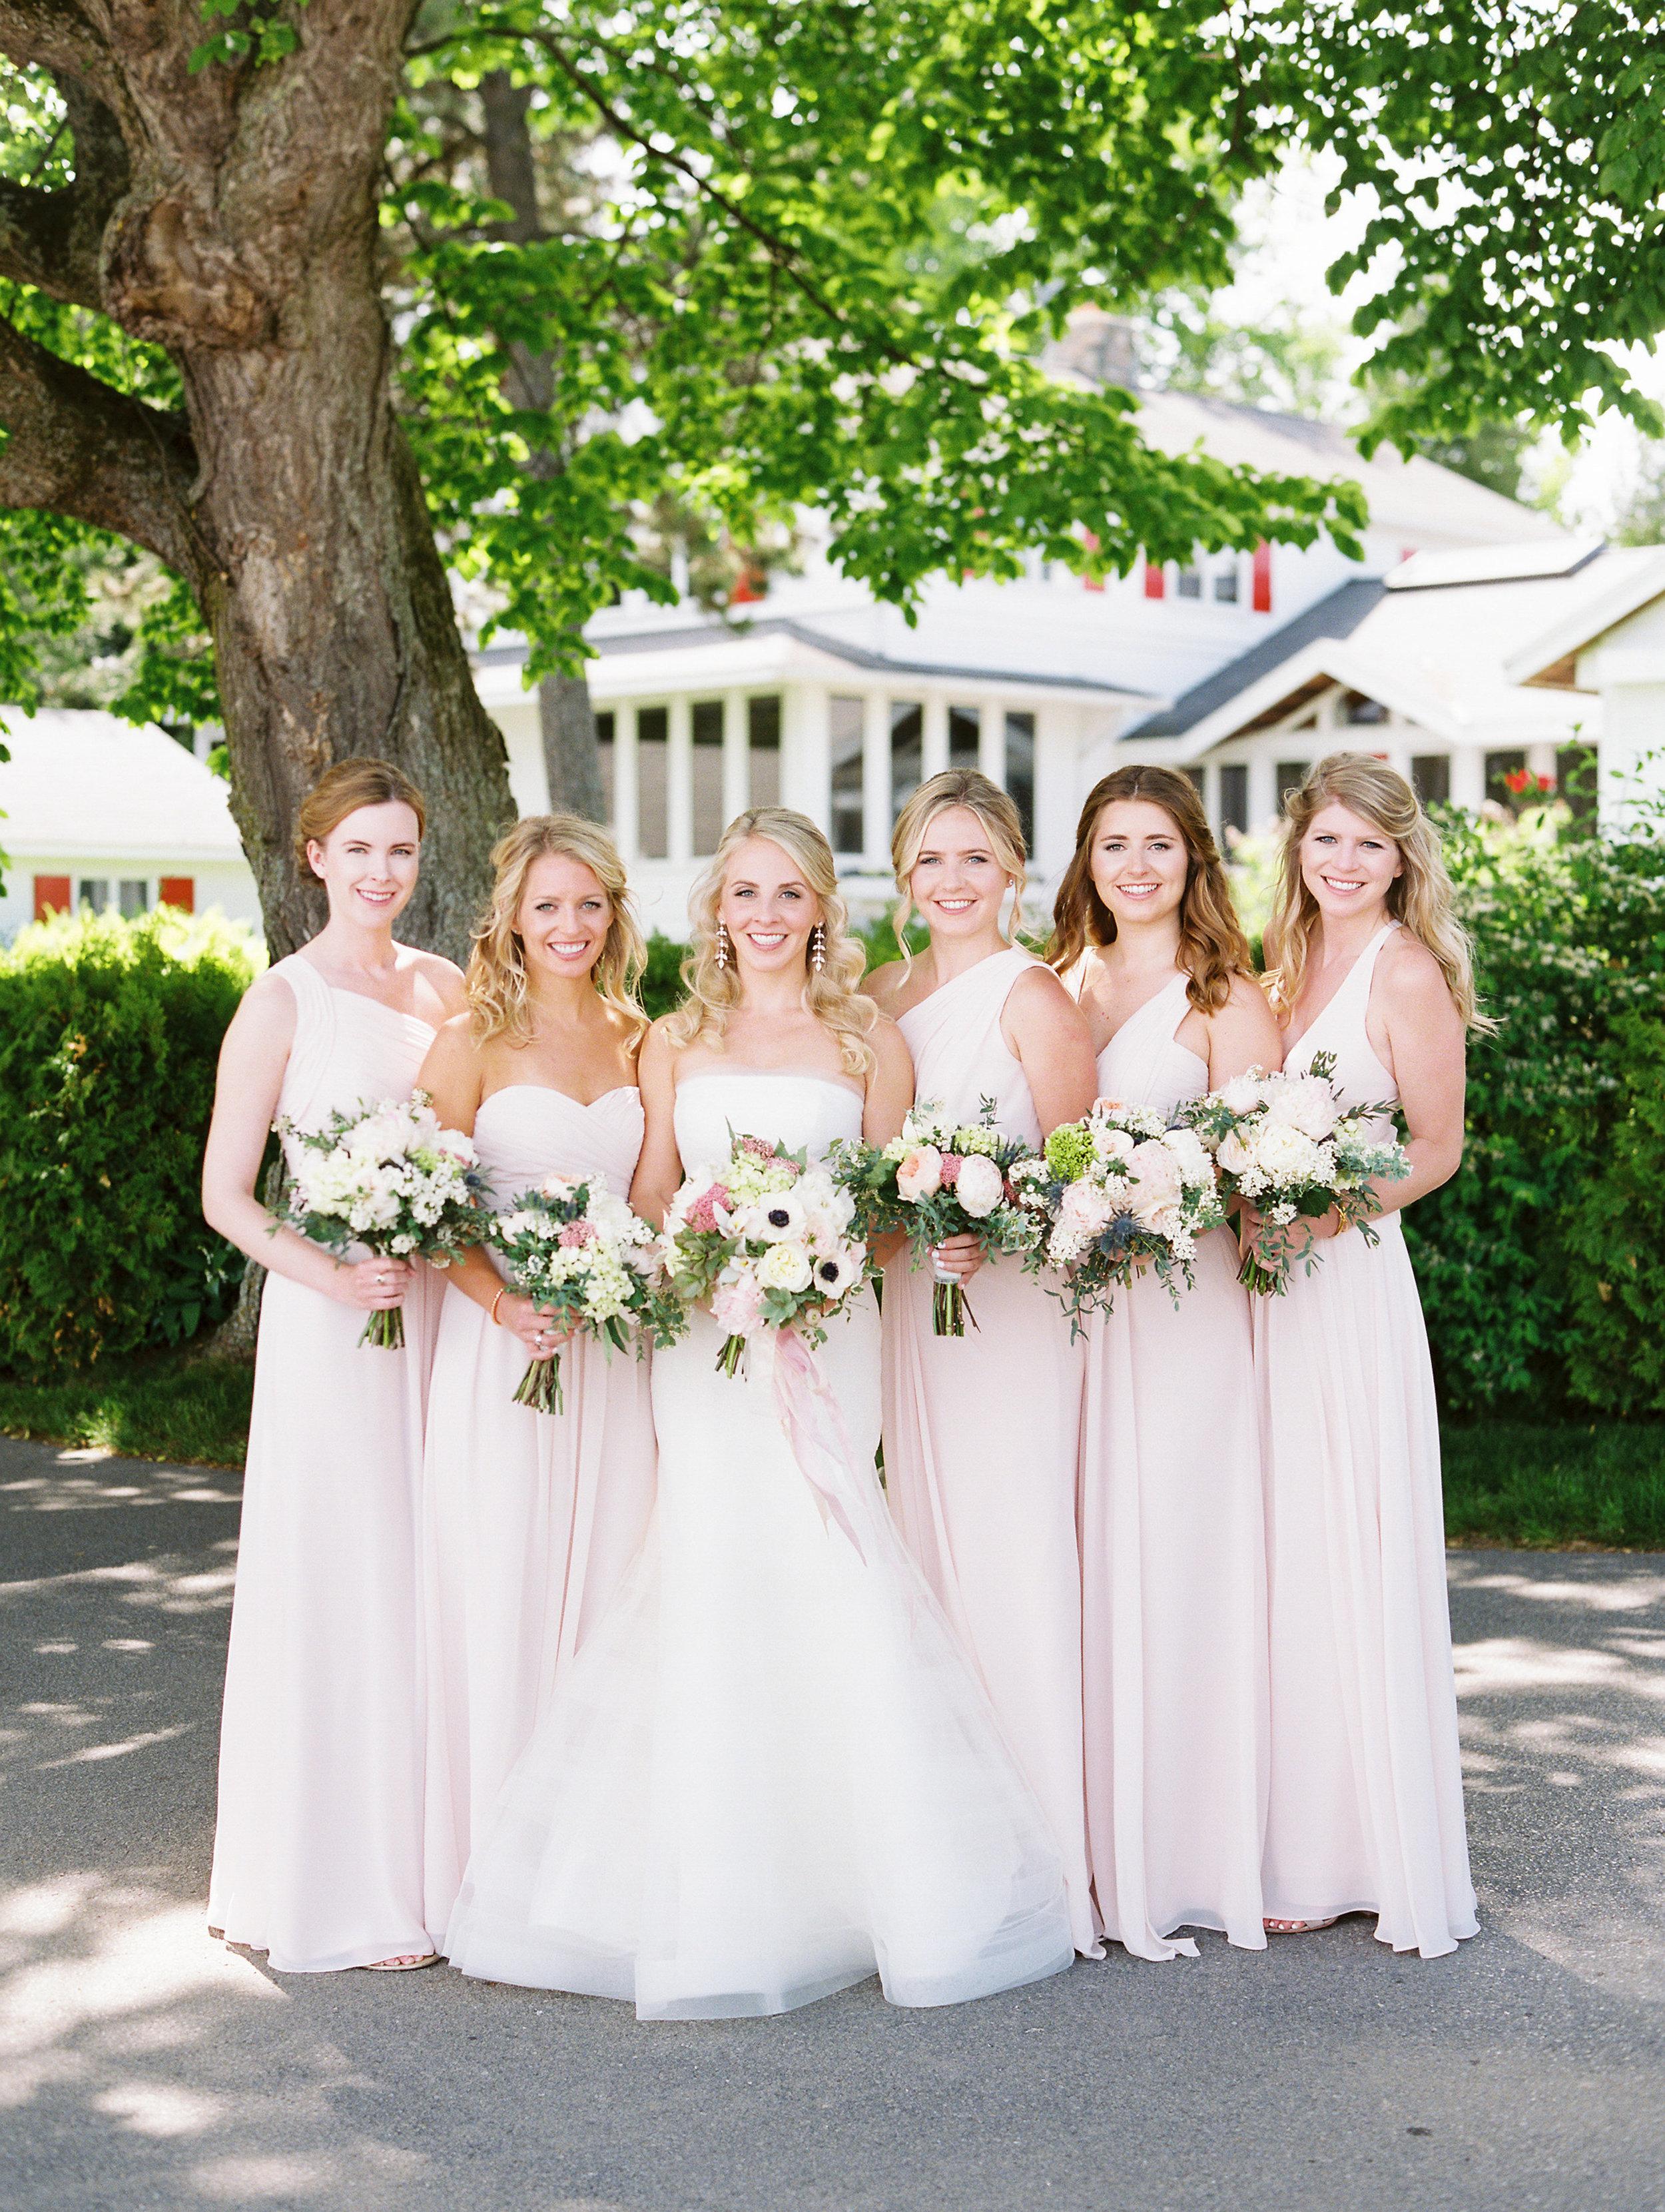 Coffman+Wedding+Bridal+Party-11.jpg